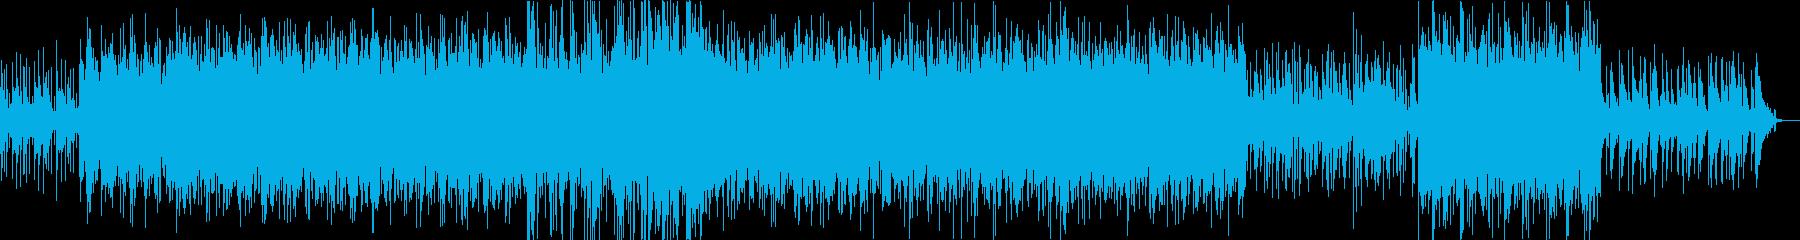 BossaNova+大正琴+笛の和洋折衷の再生済みの波形